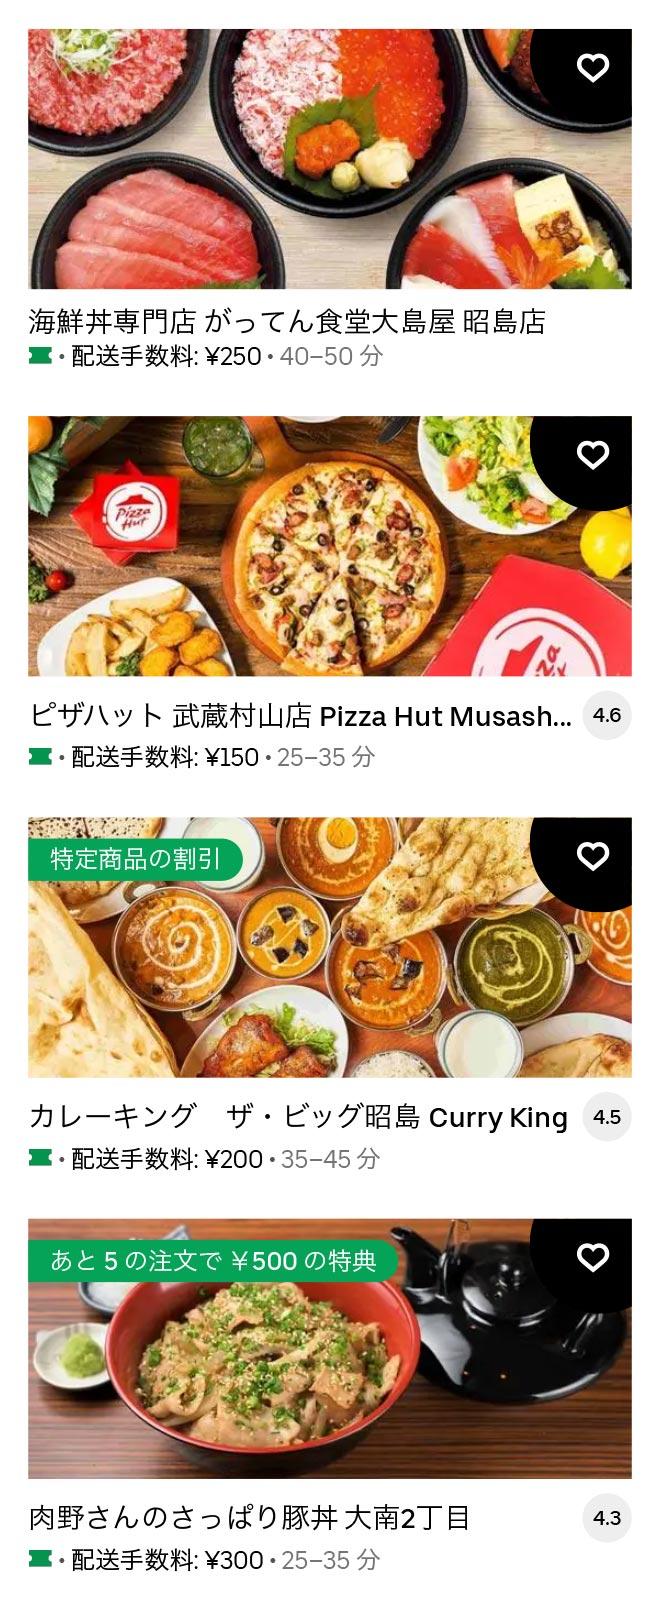 U musashi murayama 2106 08